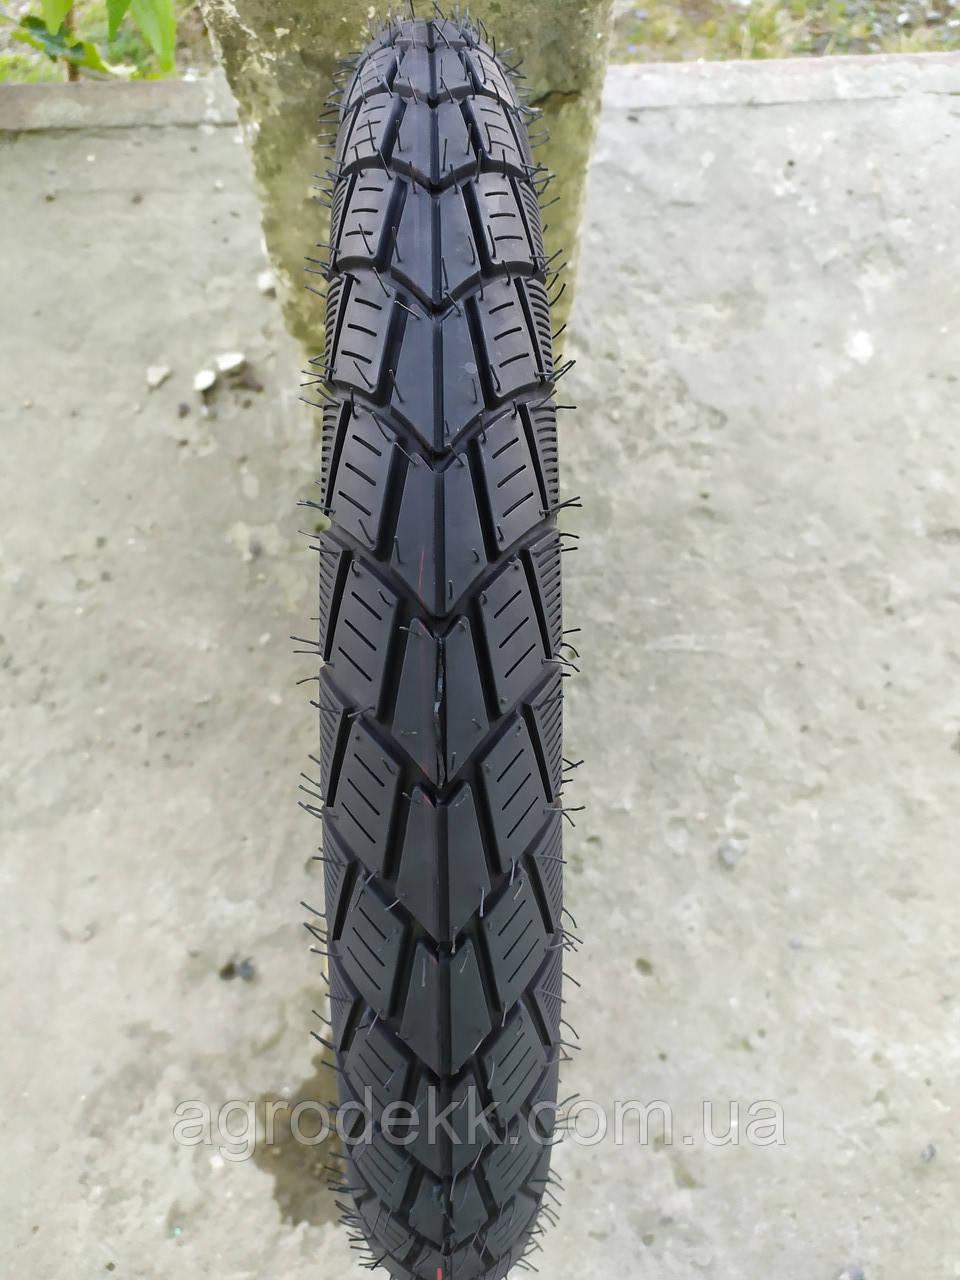 Покрышка на мопед 2.75-17 TORNADO 3 (Индия) RALCO